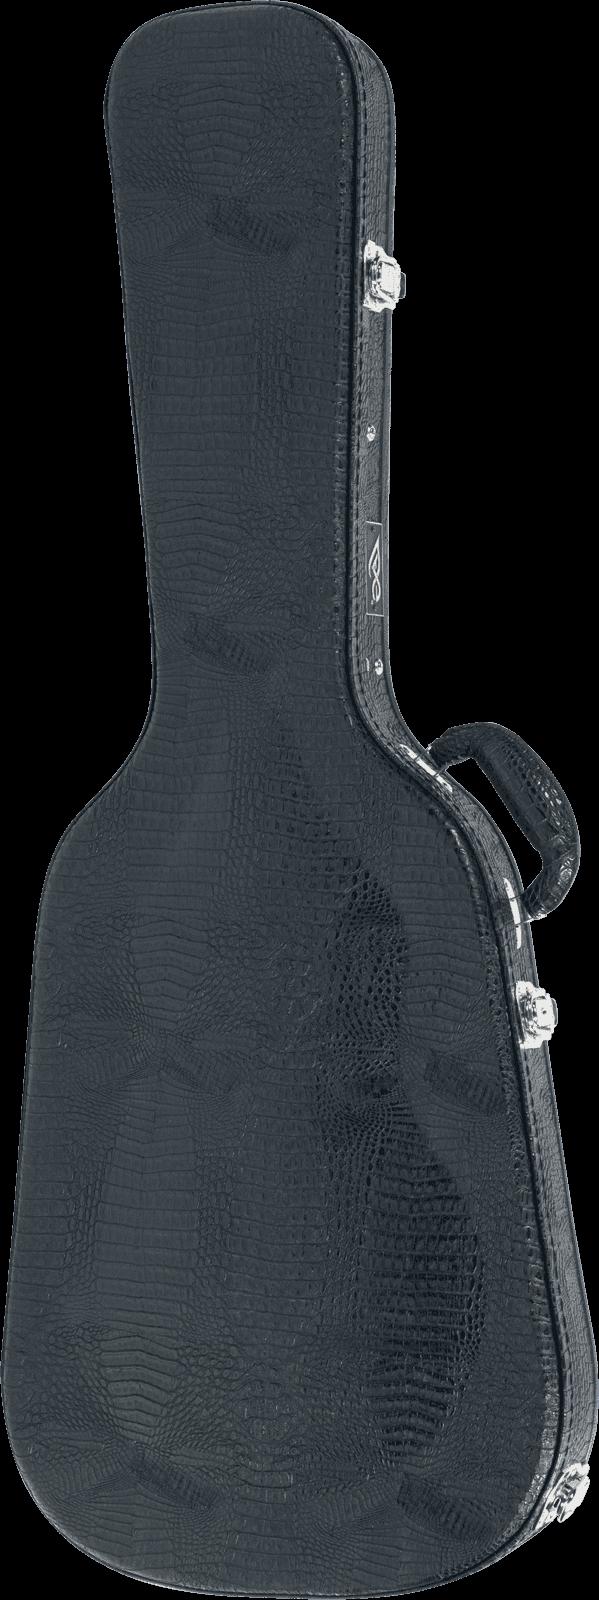 accessoires anciens produits ark7 l l g guitars. Black Bedroom Furniture Sets. Home Design Ideas